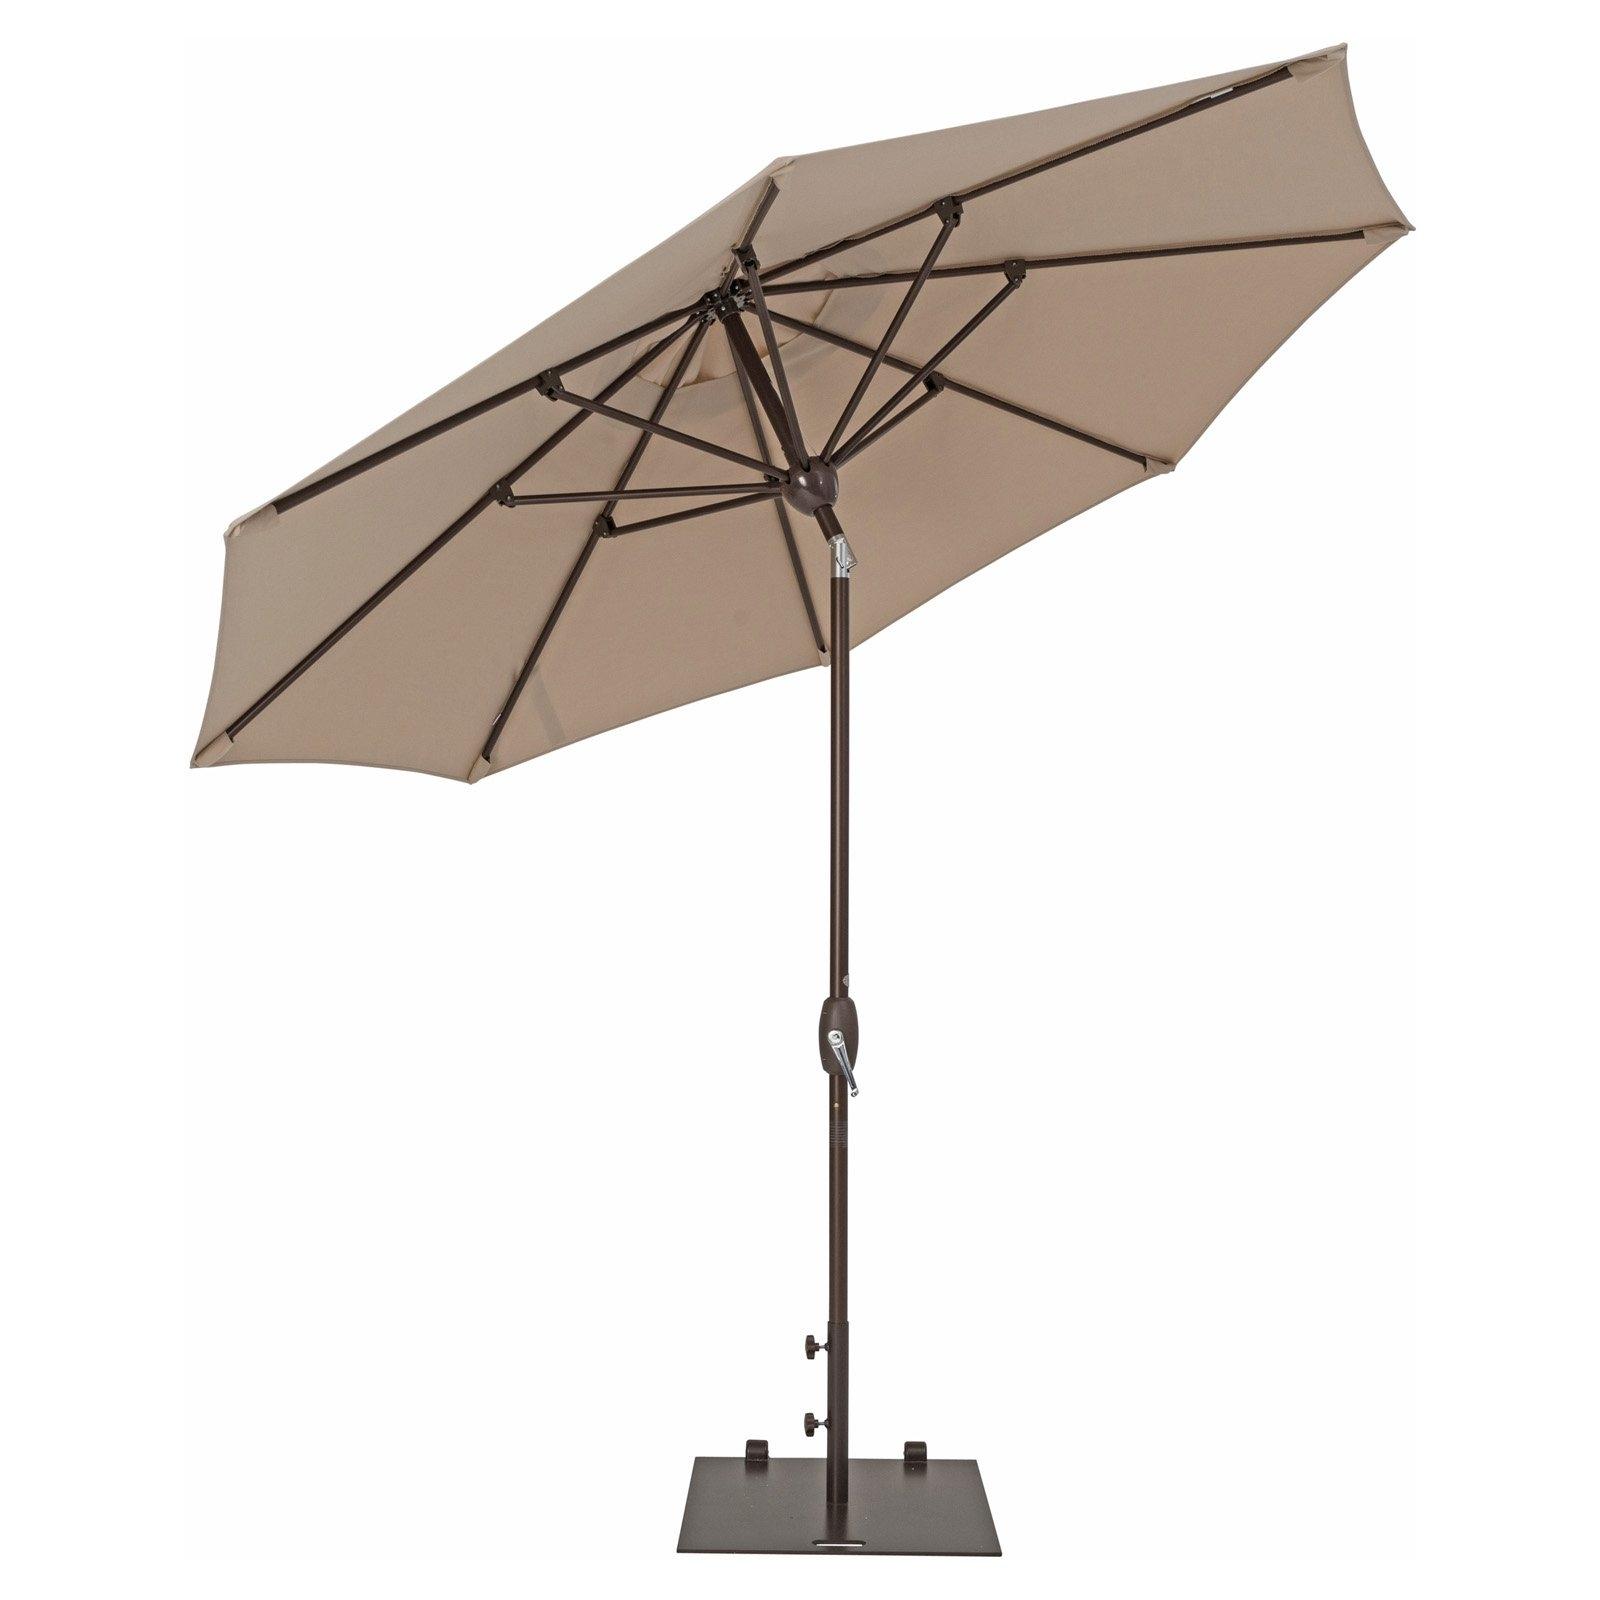 Preferred Patio Umbrellas With Sunbrella Fabric Regarding Trueshade Plus 9' Market Umbrella With Sunbrella Fabric, Auto Tilt (View 10 of 20)